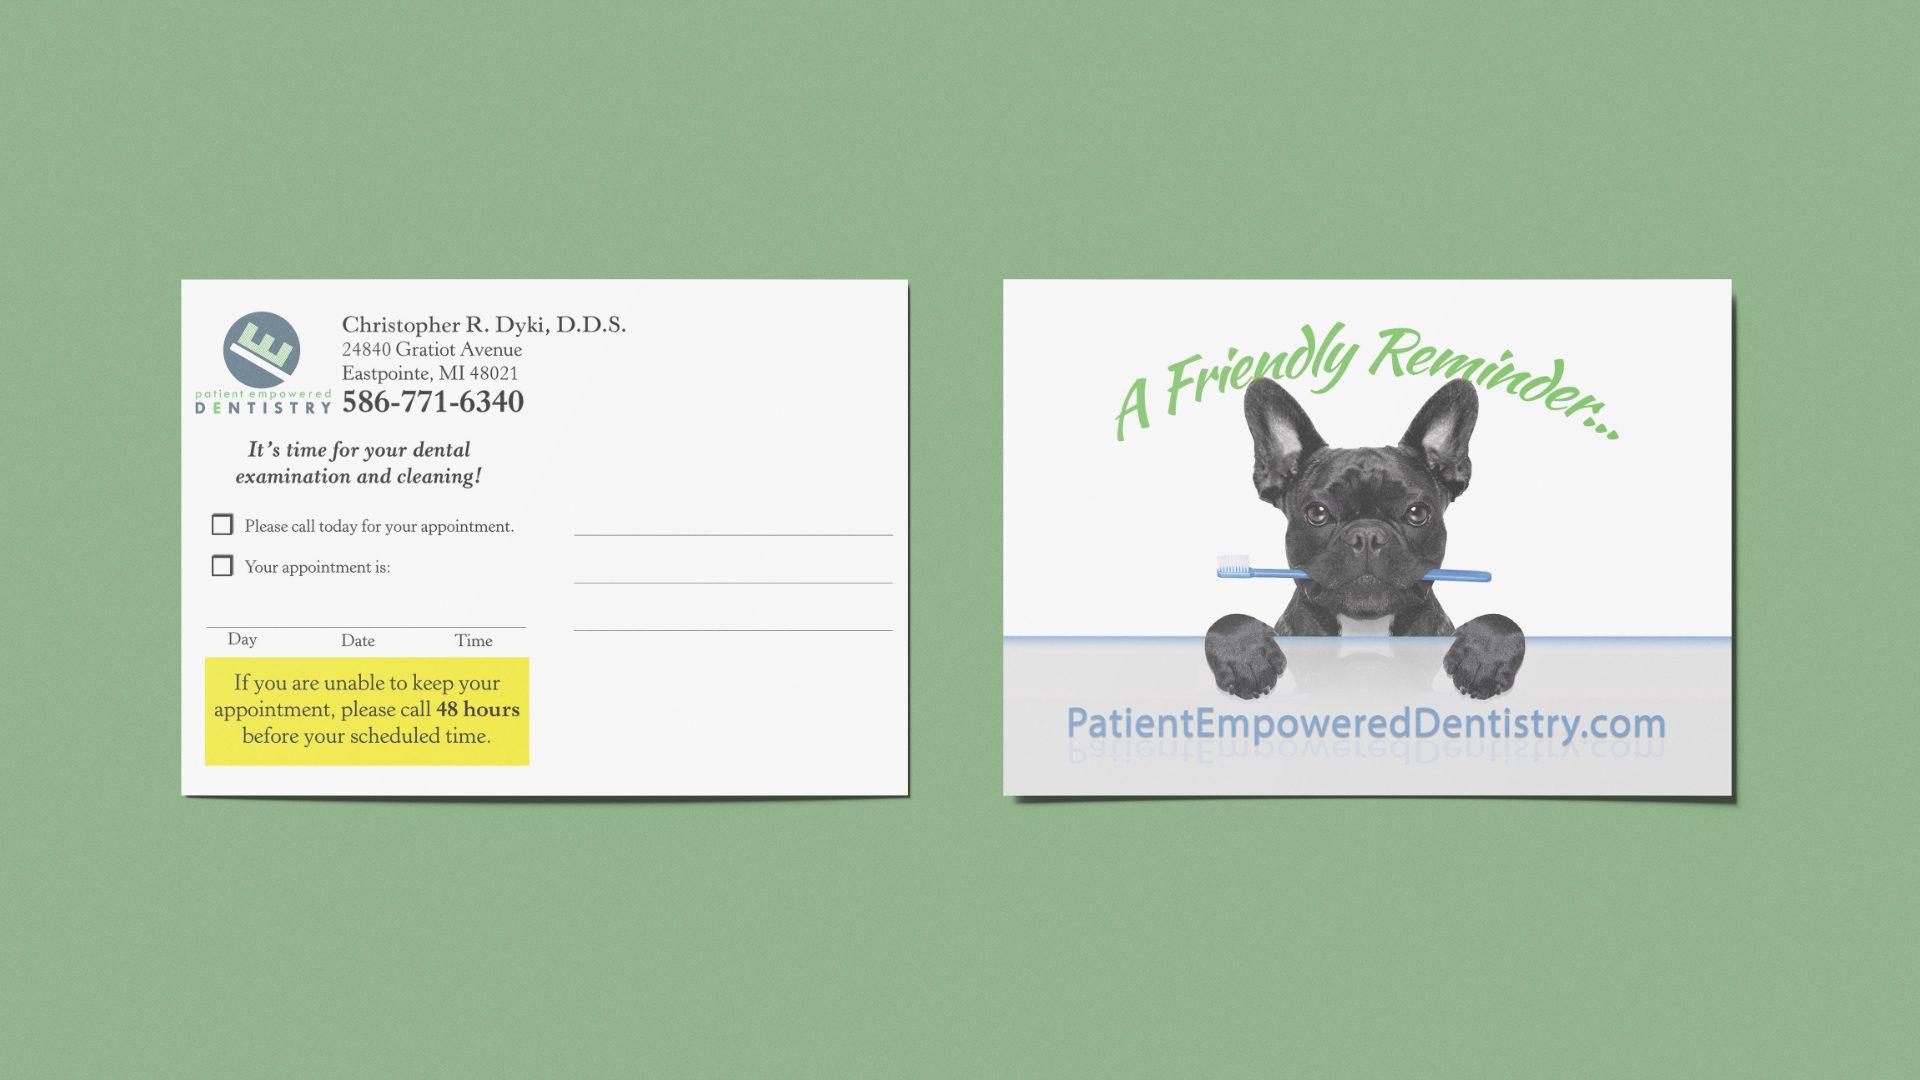 Patient Empowered Dentistry - Reminder Postcard Mockup 03